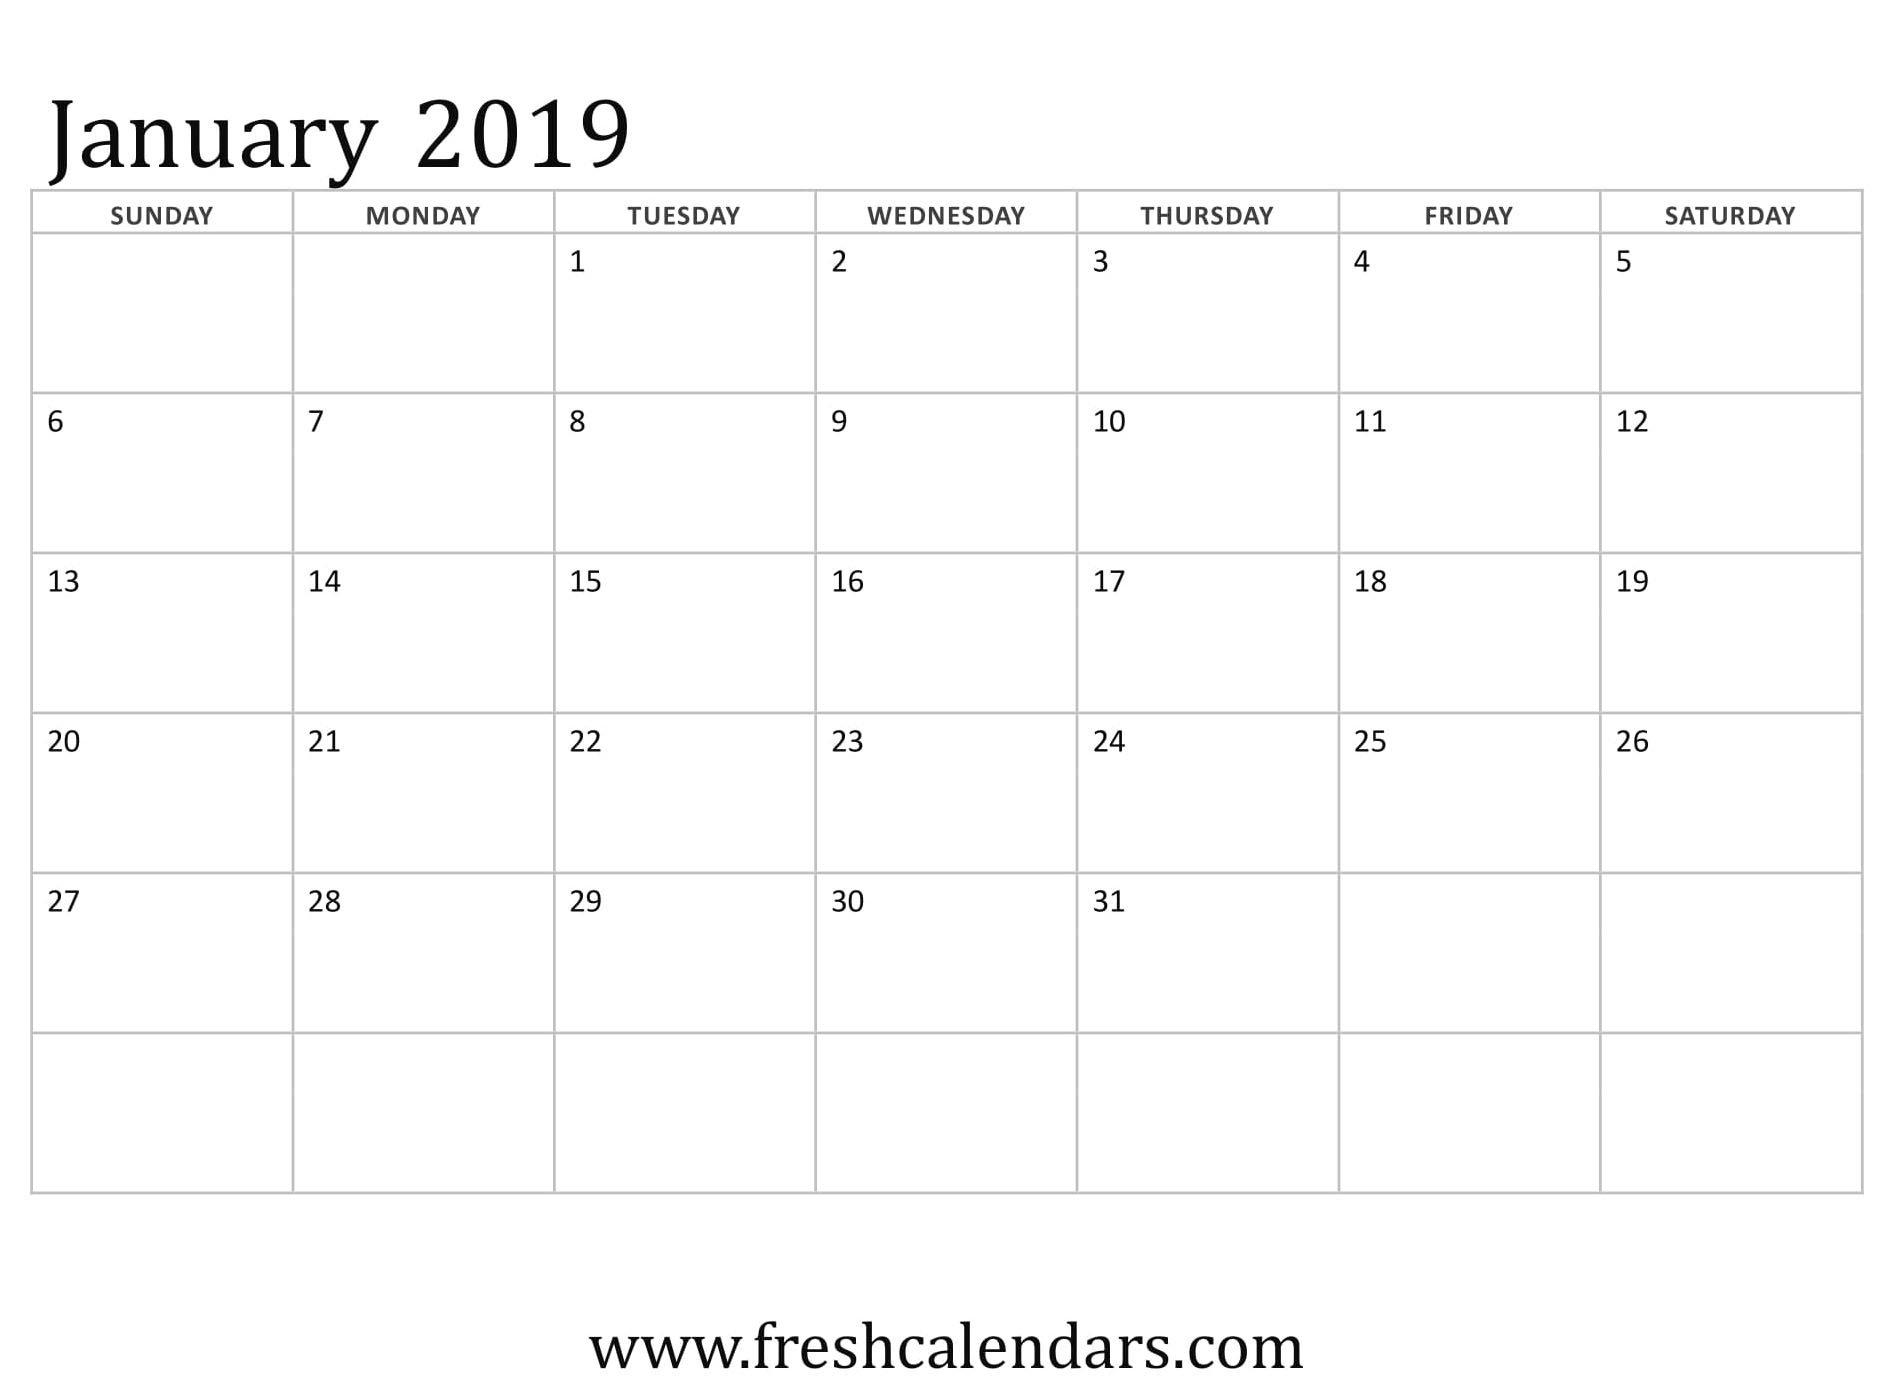 January 2019 Printable Calendars – Fresh Calendars Calendar 2019 Enero